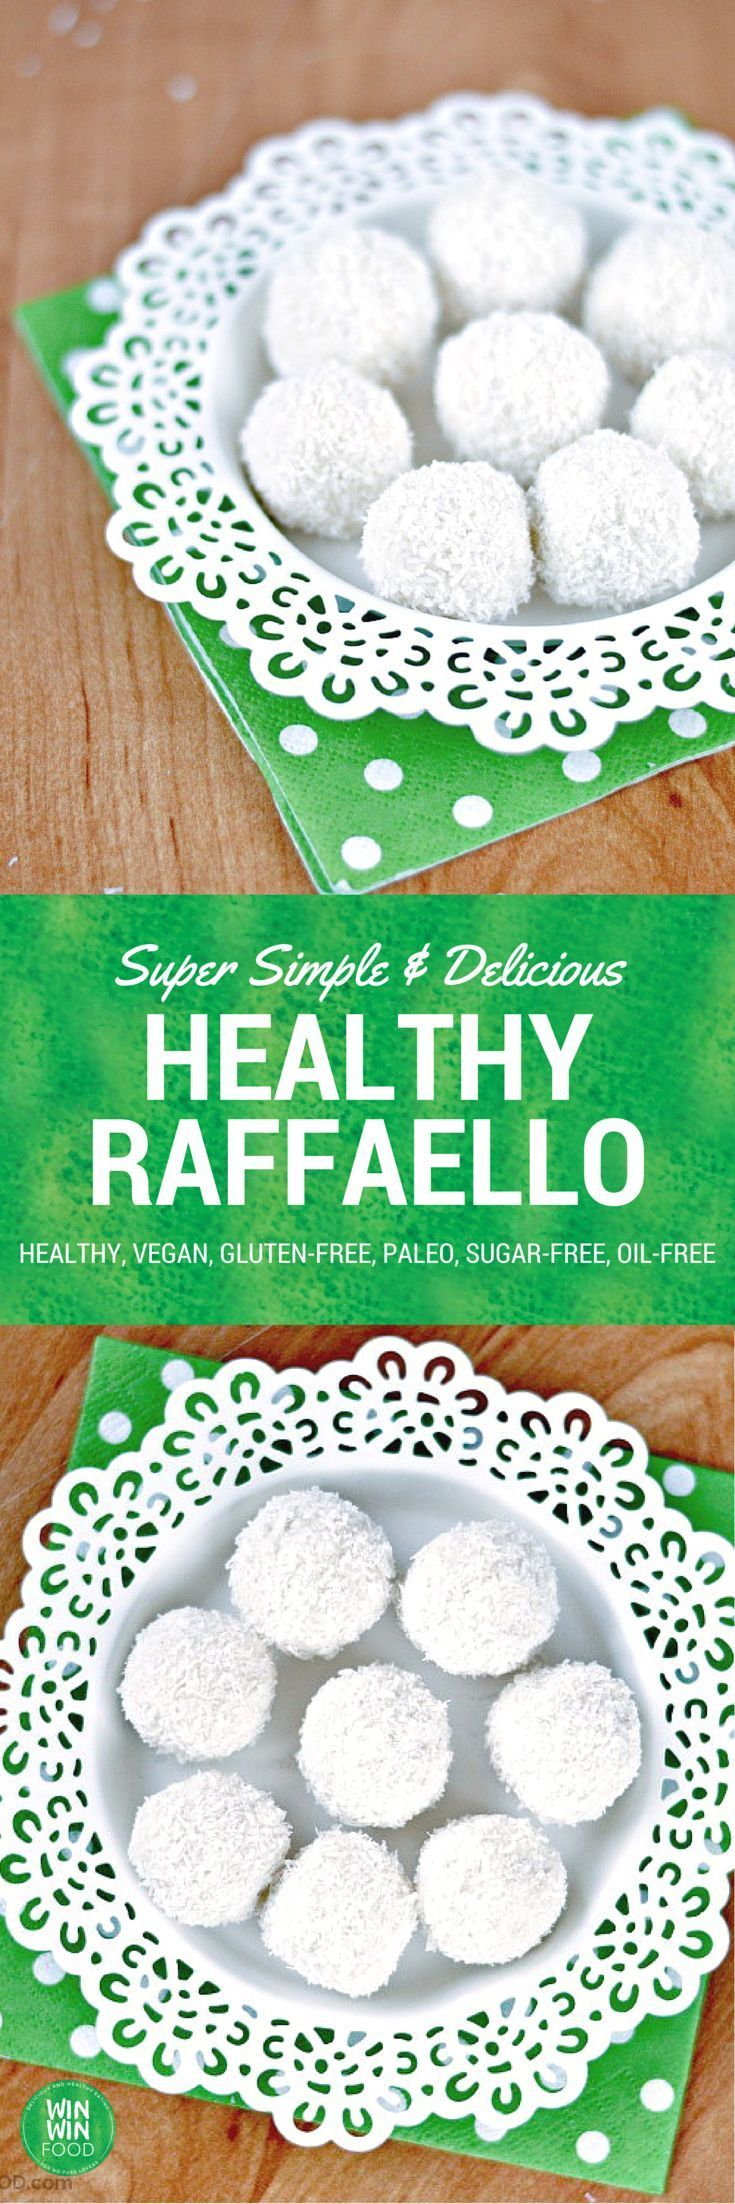 Healthy Raffaello | WIN-WINFOOD.com #healthy #vegan #sugarfree #glutenfree #oilfree #paleo